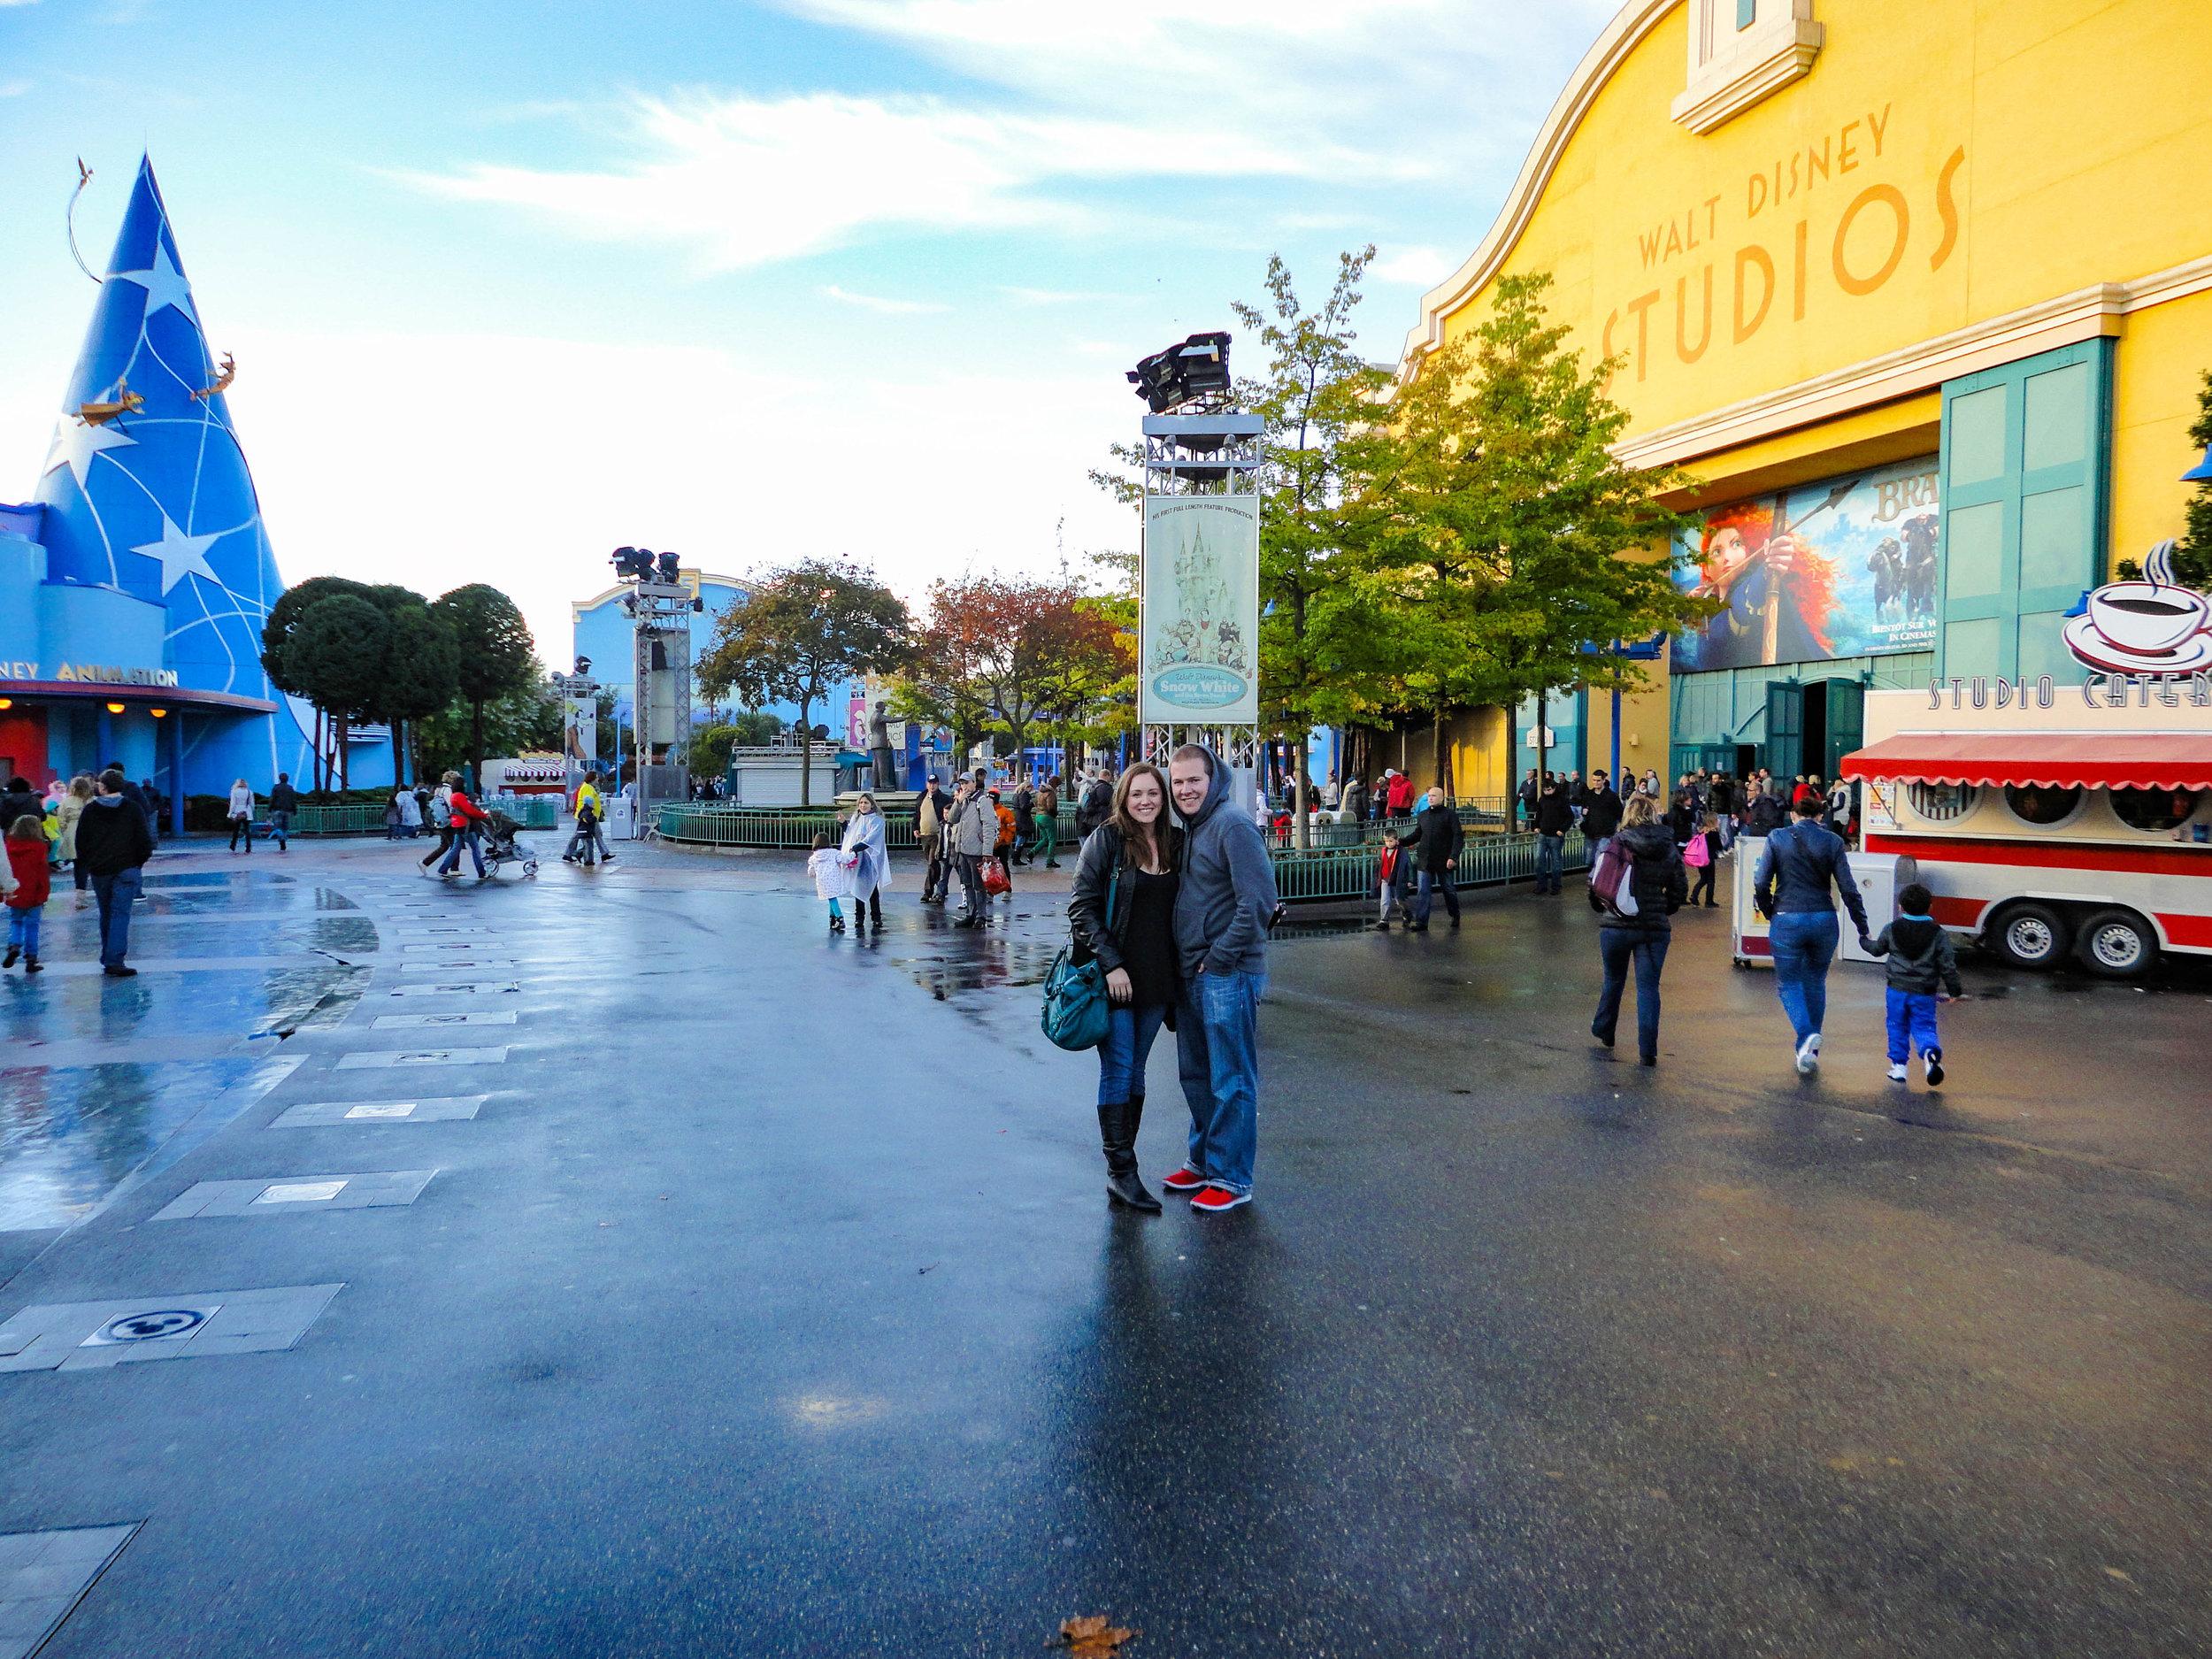 Paris_Disneyland-Walt_Disney_Studios.jpg